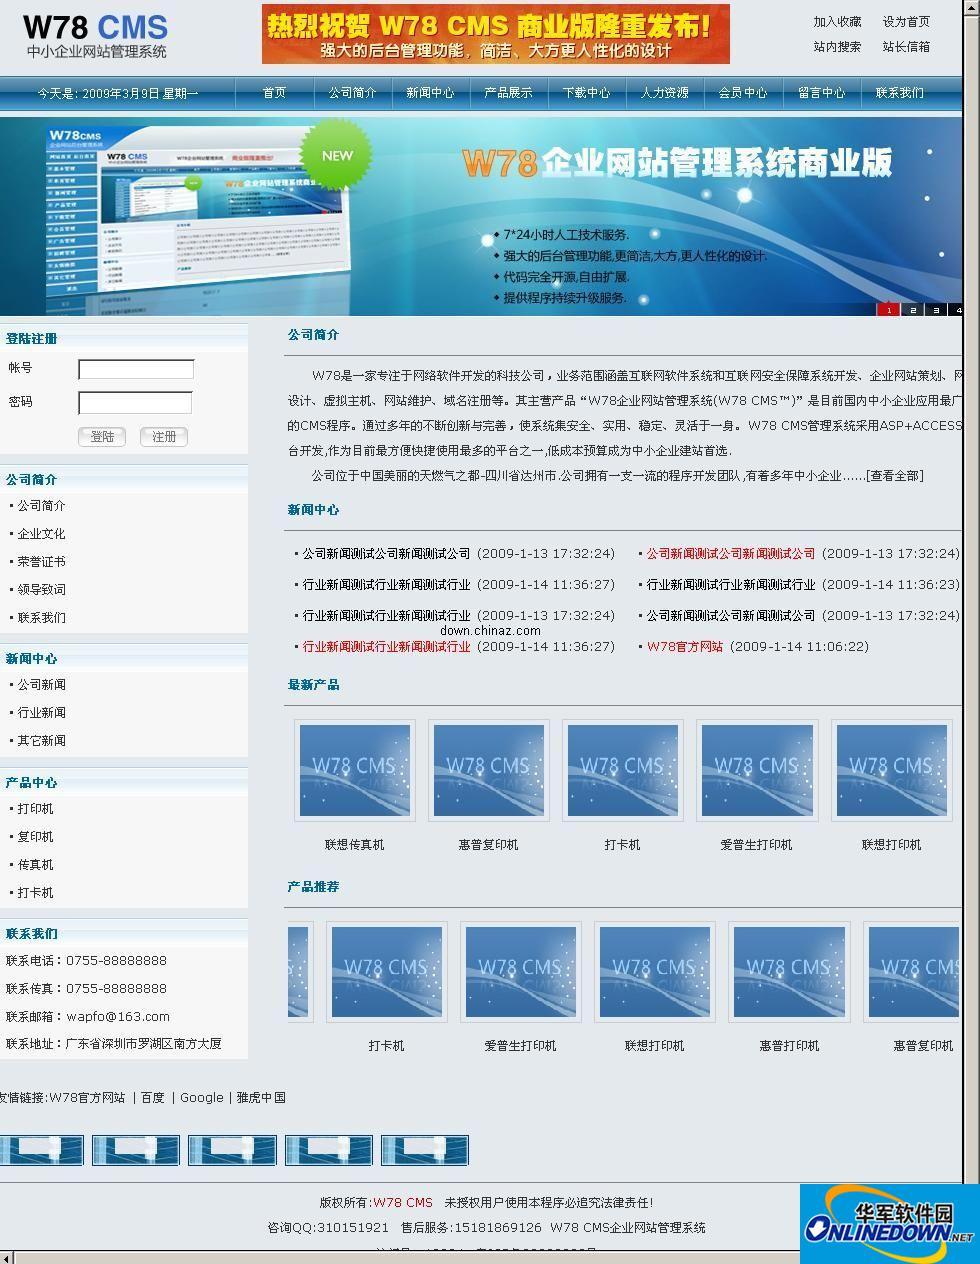 W78CMS asp 企业网站管理系统 简体中文版